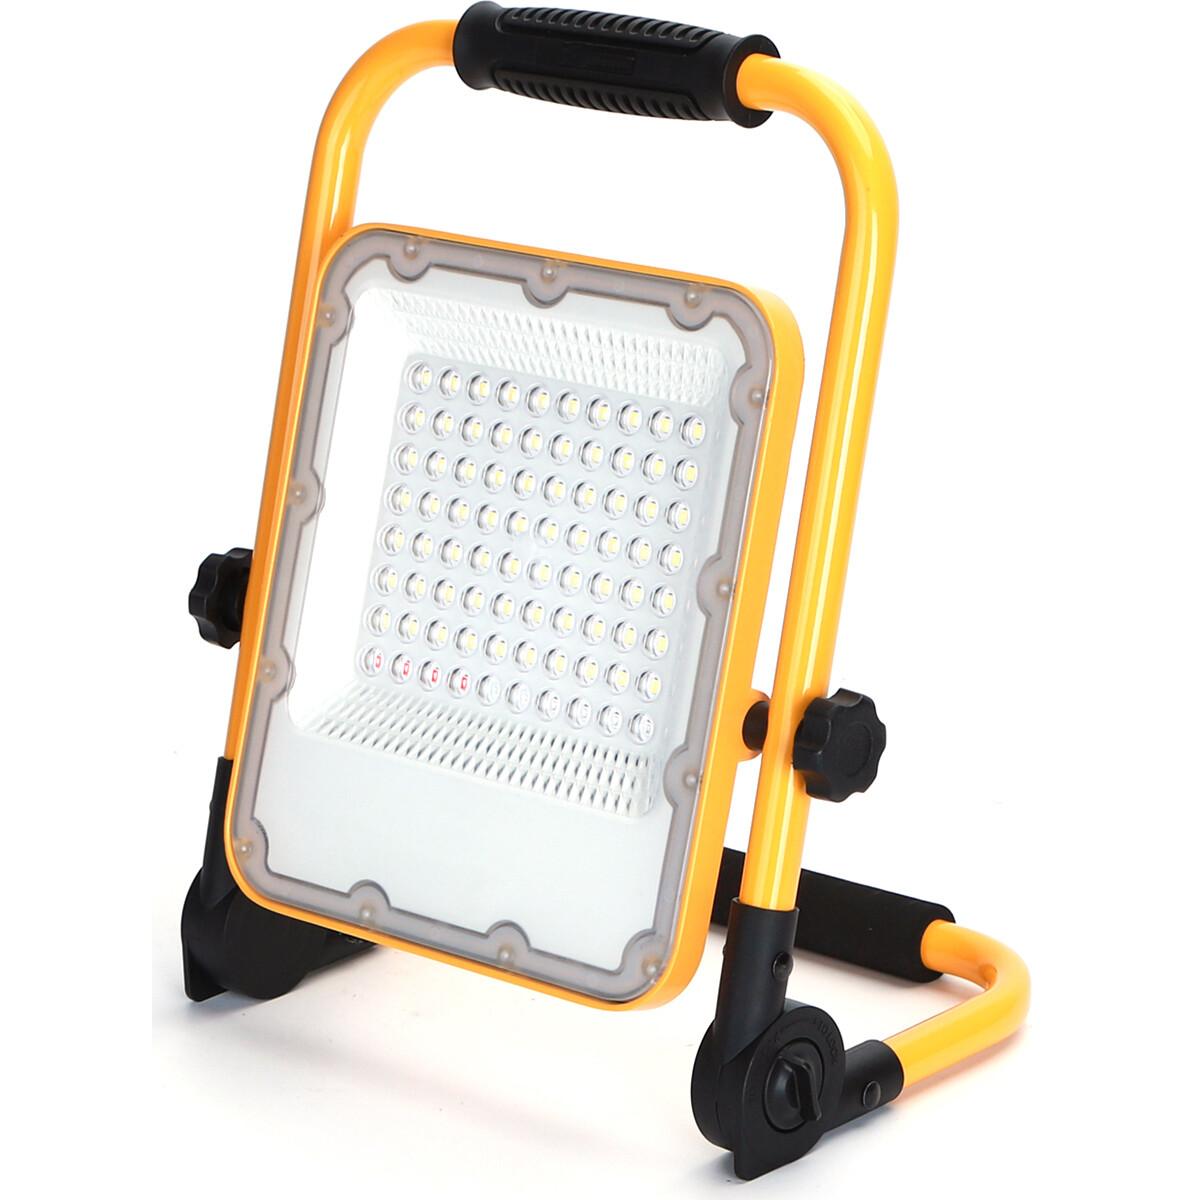 LED Bouwlamp op Accu met Statief - Aigi Worky - 50 Watt - Helder/Koud Wit 6500K - Waterdicht IP65 -